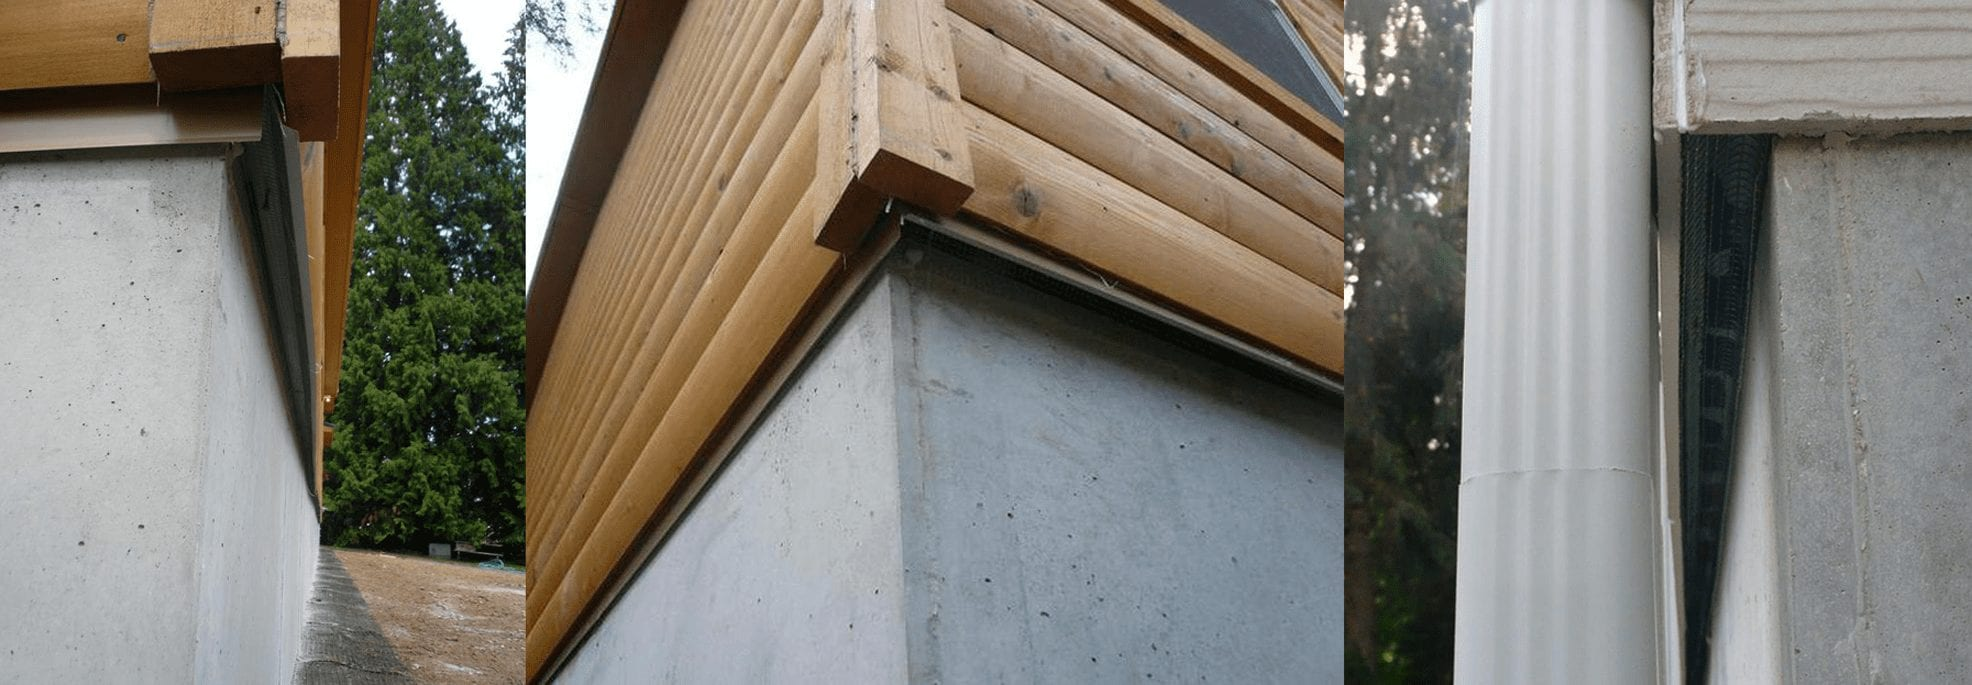 Duraskirt mobile home skirting kits pricing made in usa - Modular homes vs site built ...